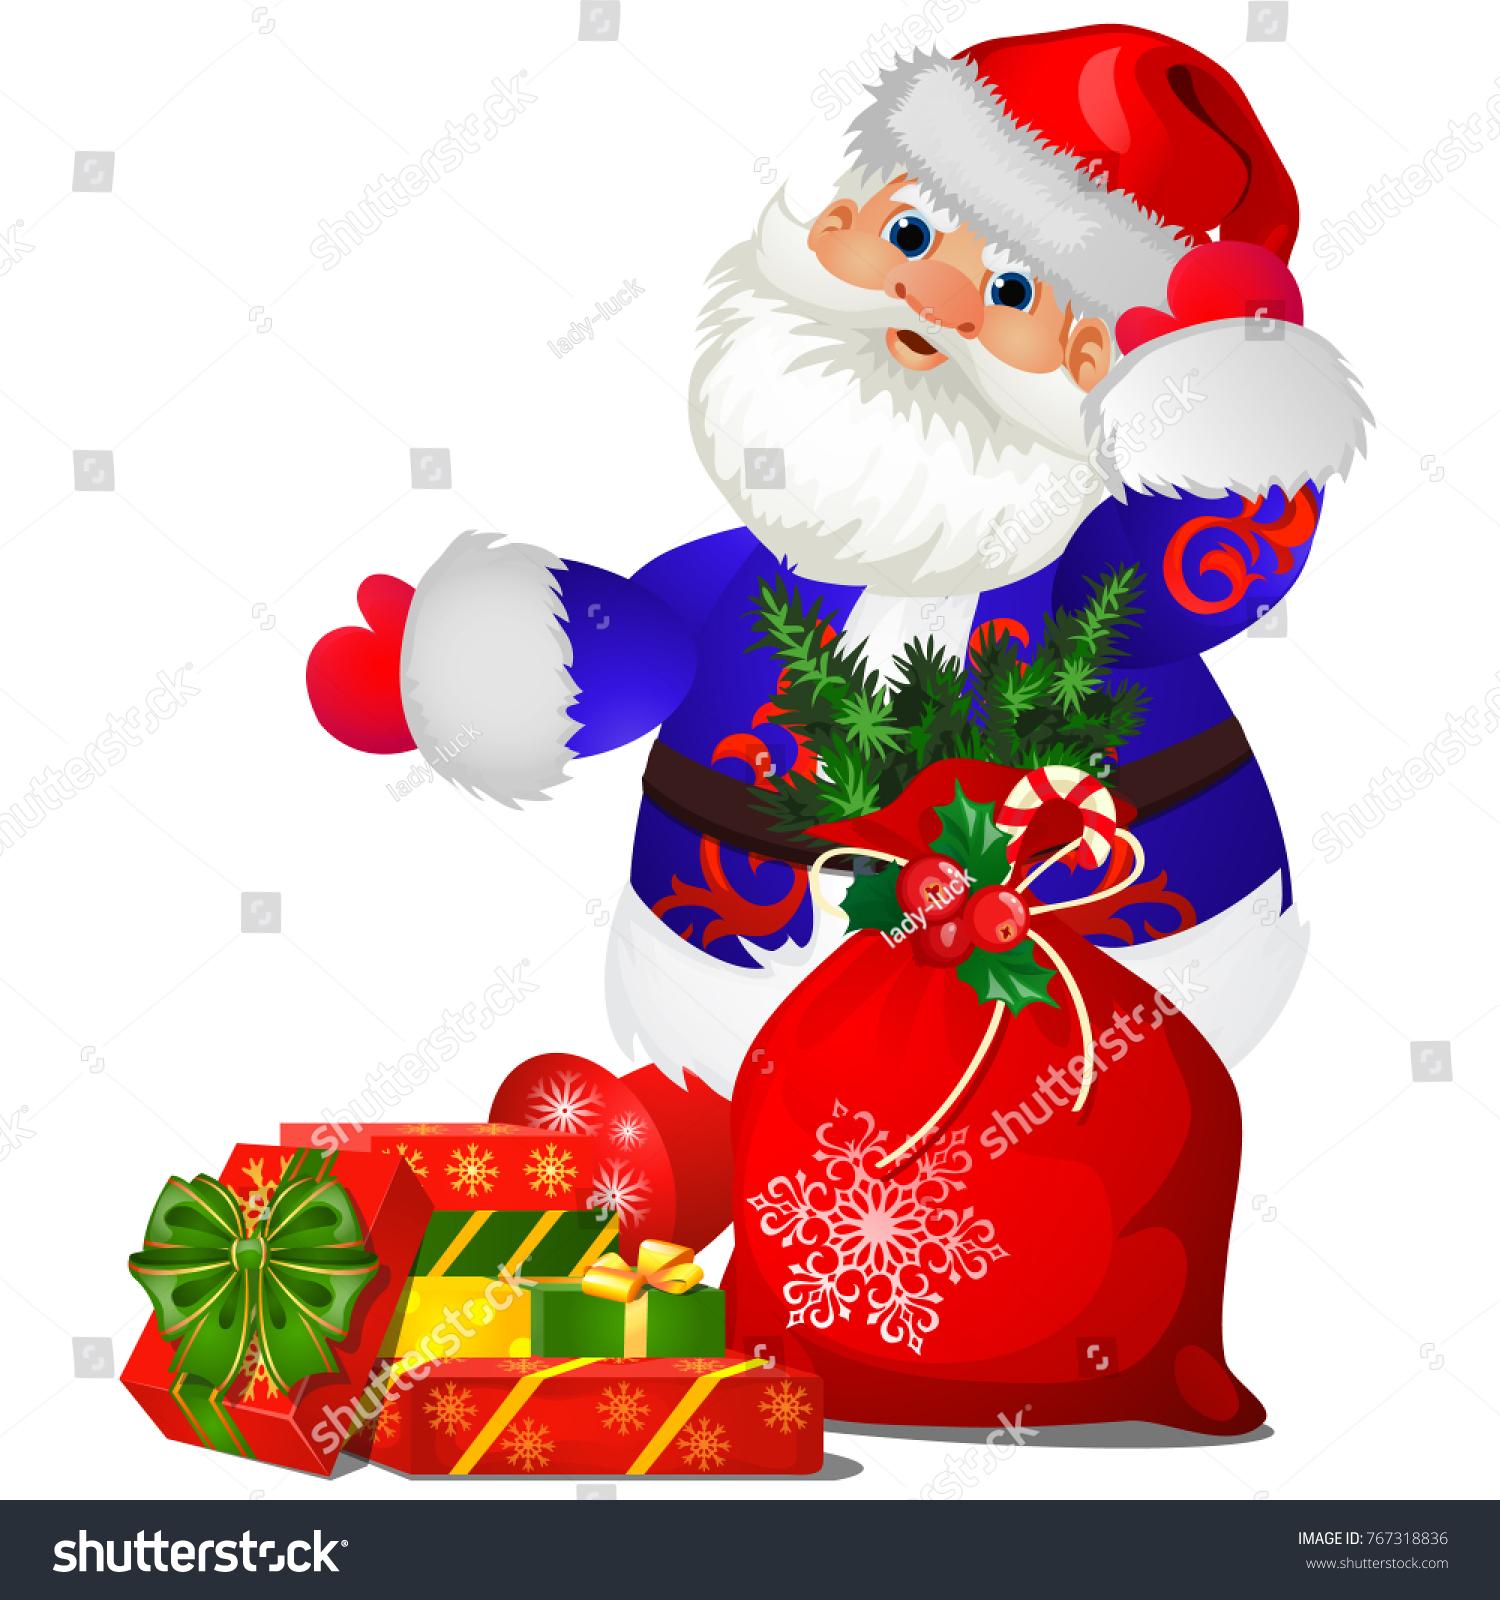 Animated Santa Claus Blue Christmas Costume Stock Vector (Royalty ...